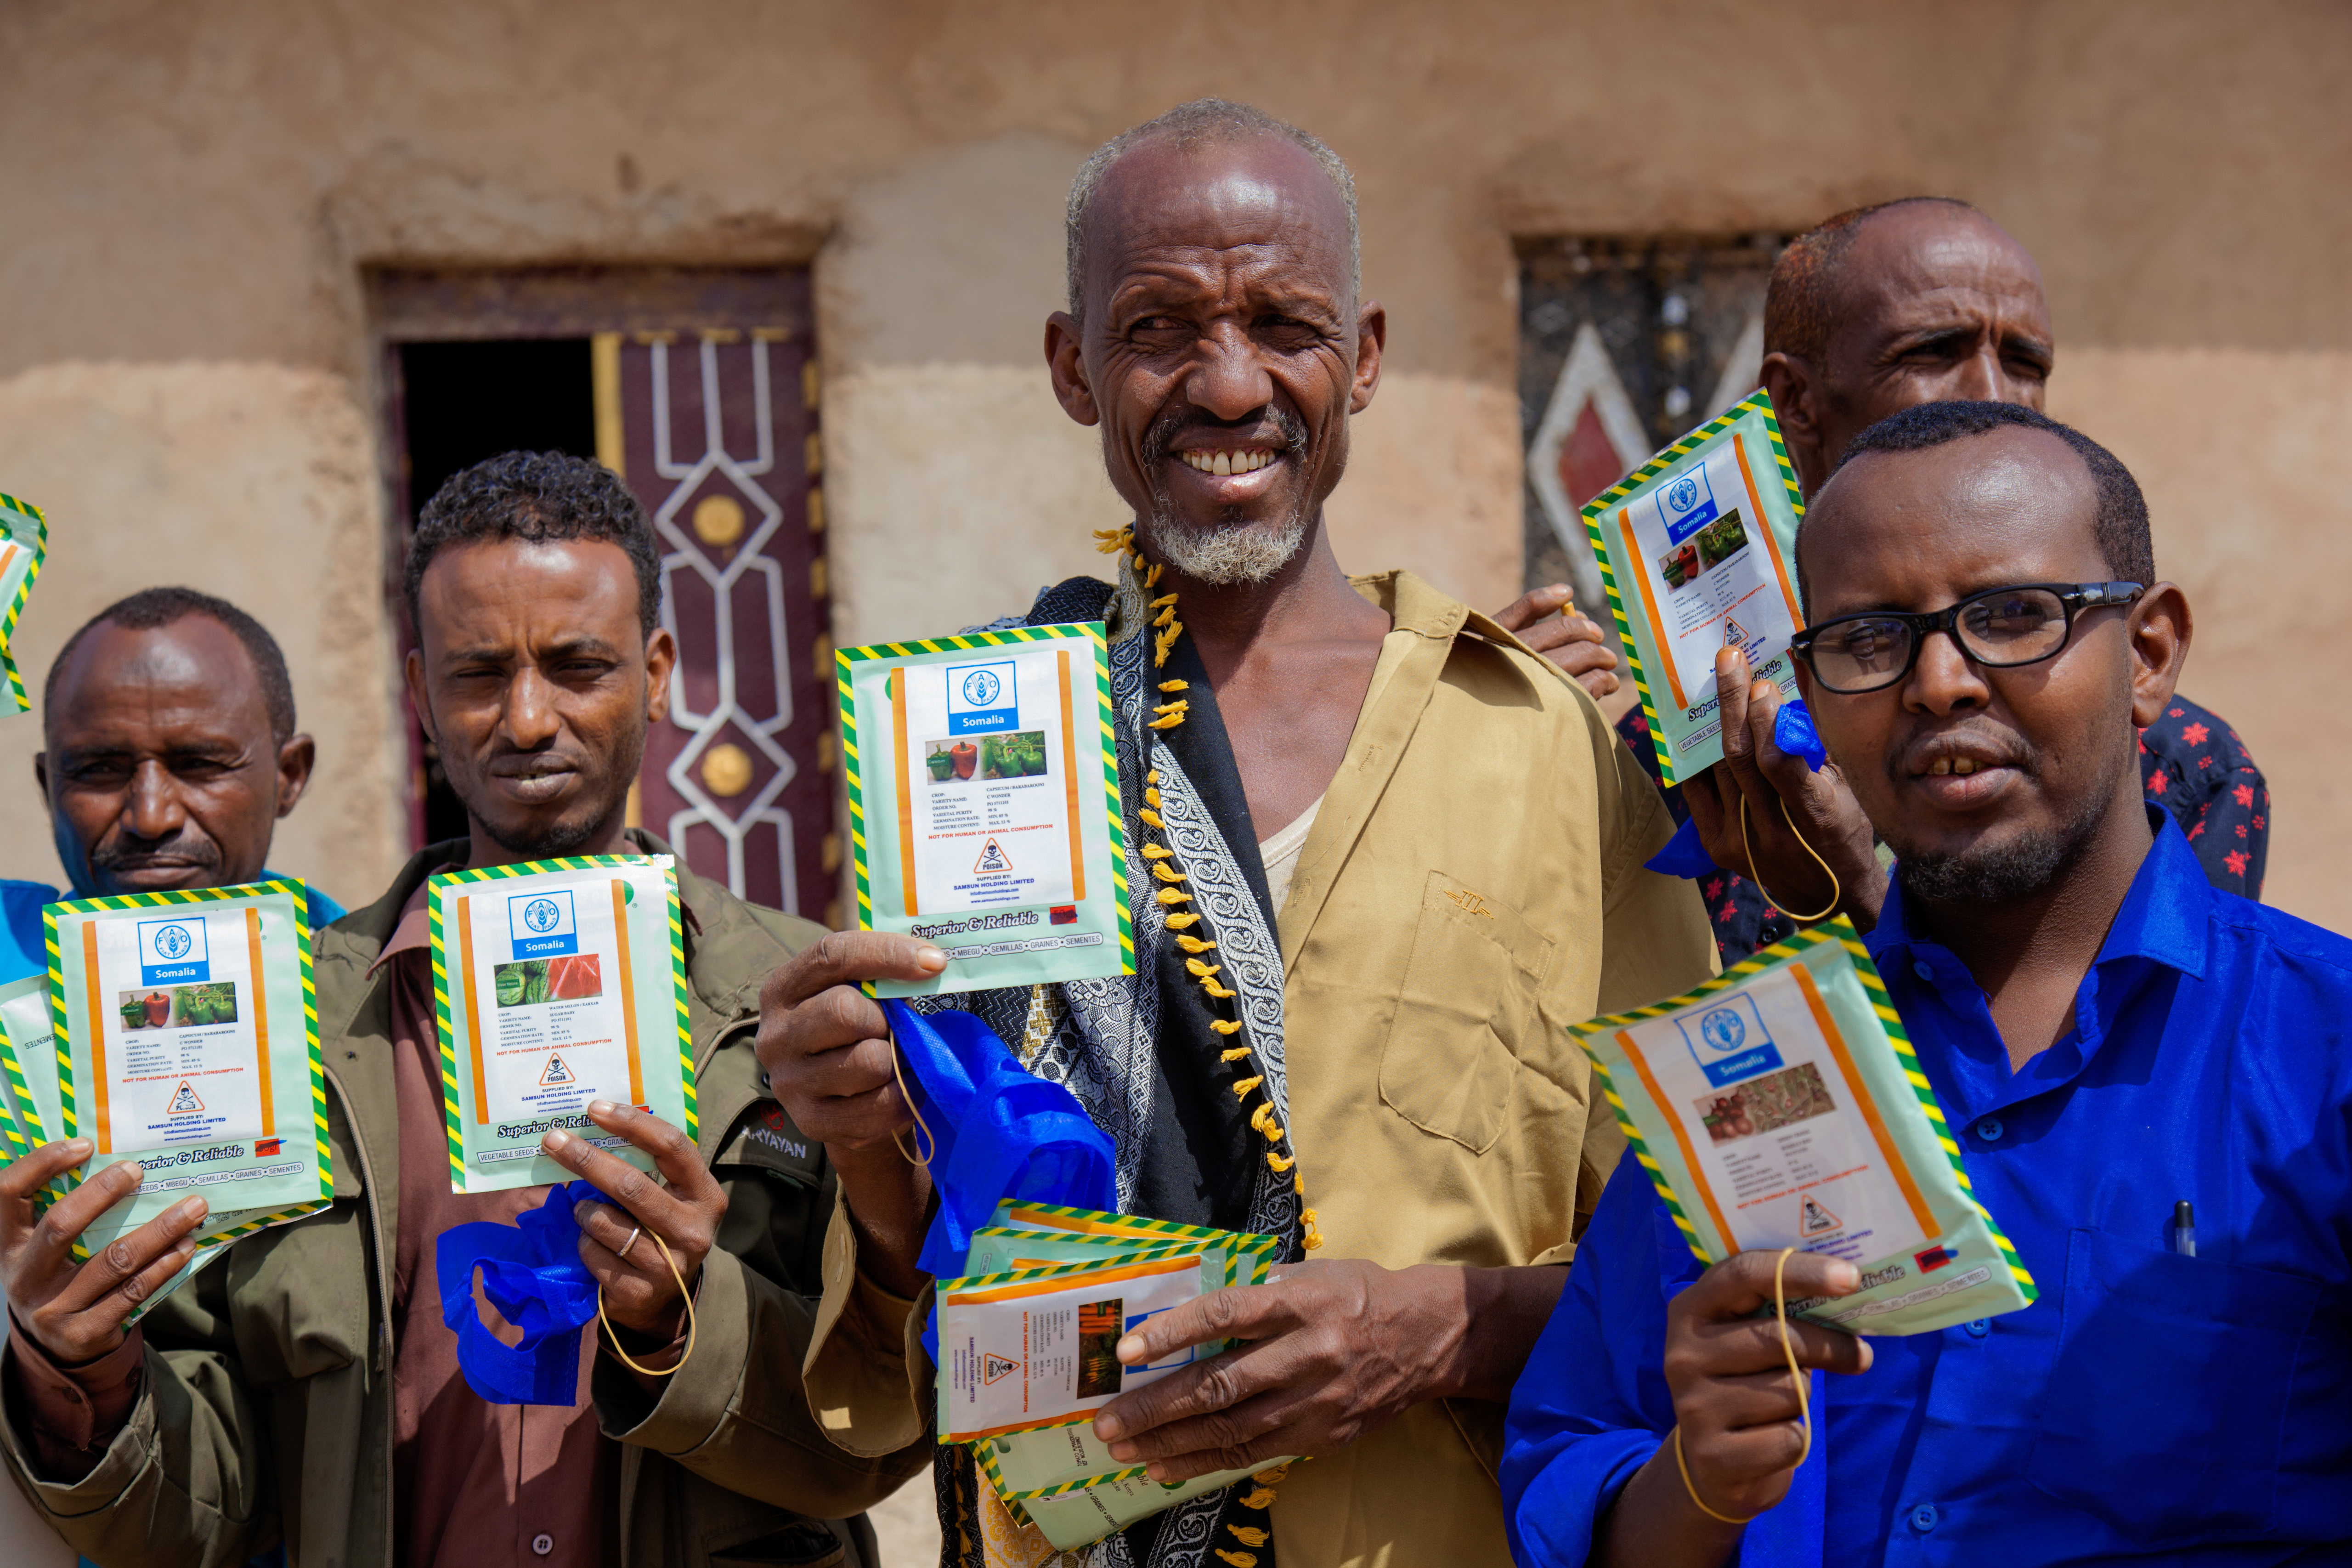 Desert locust livelihood support in Somaliland